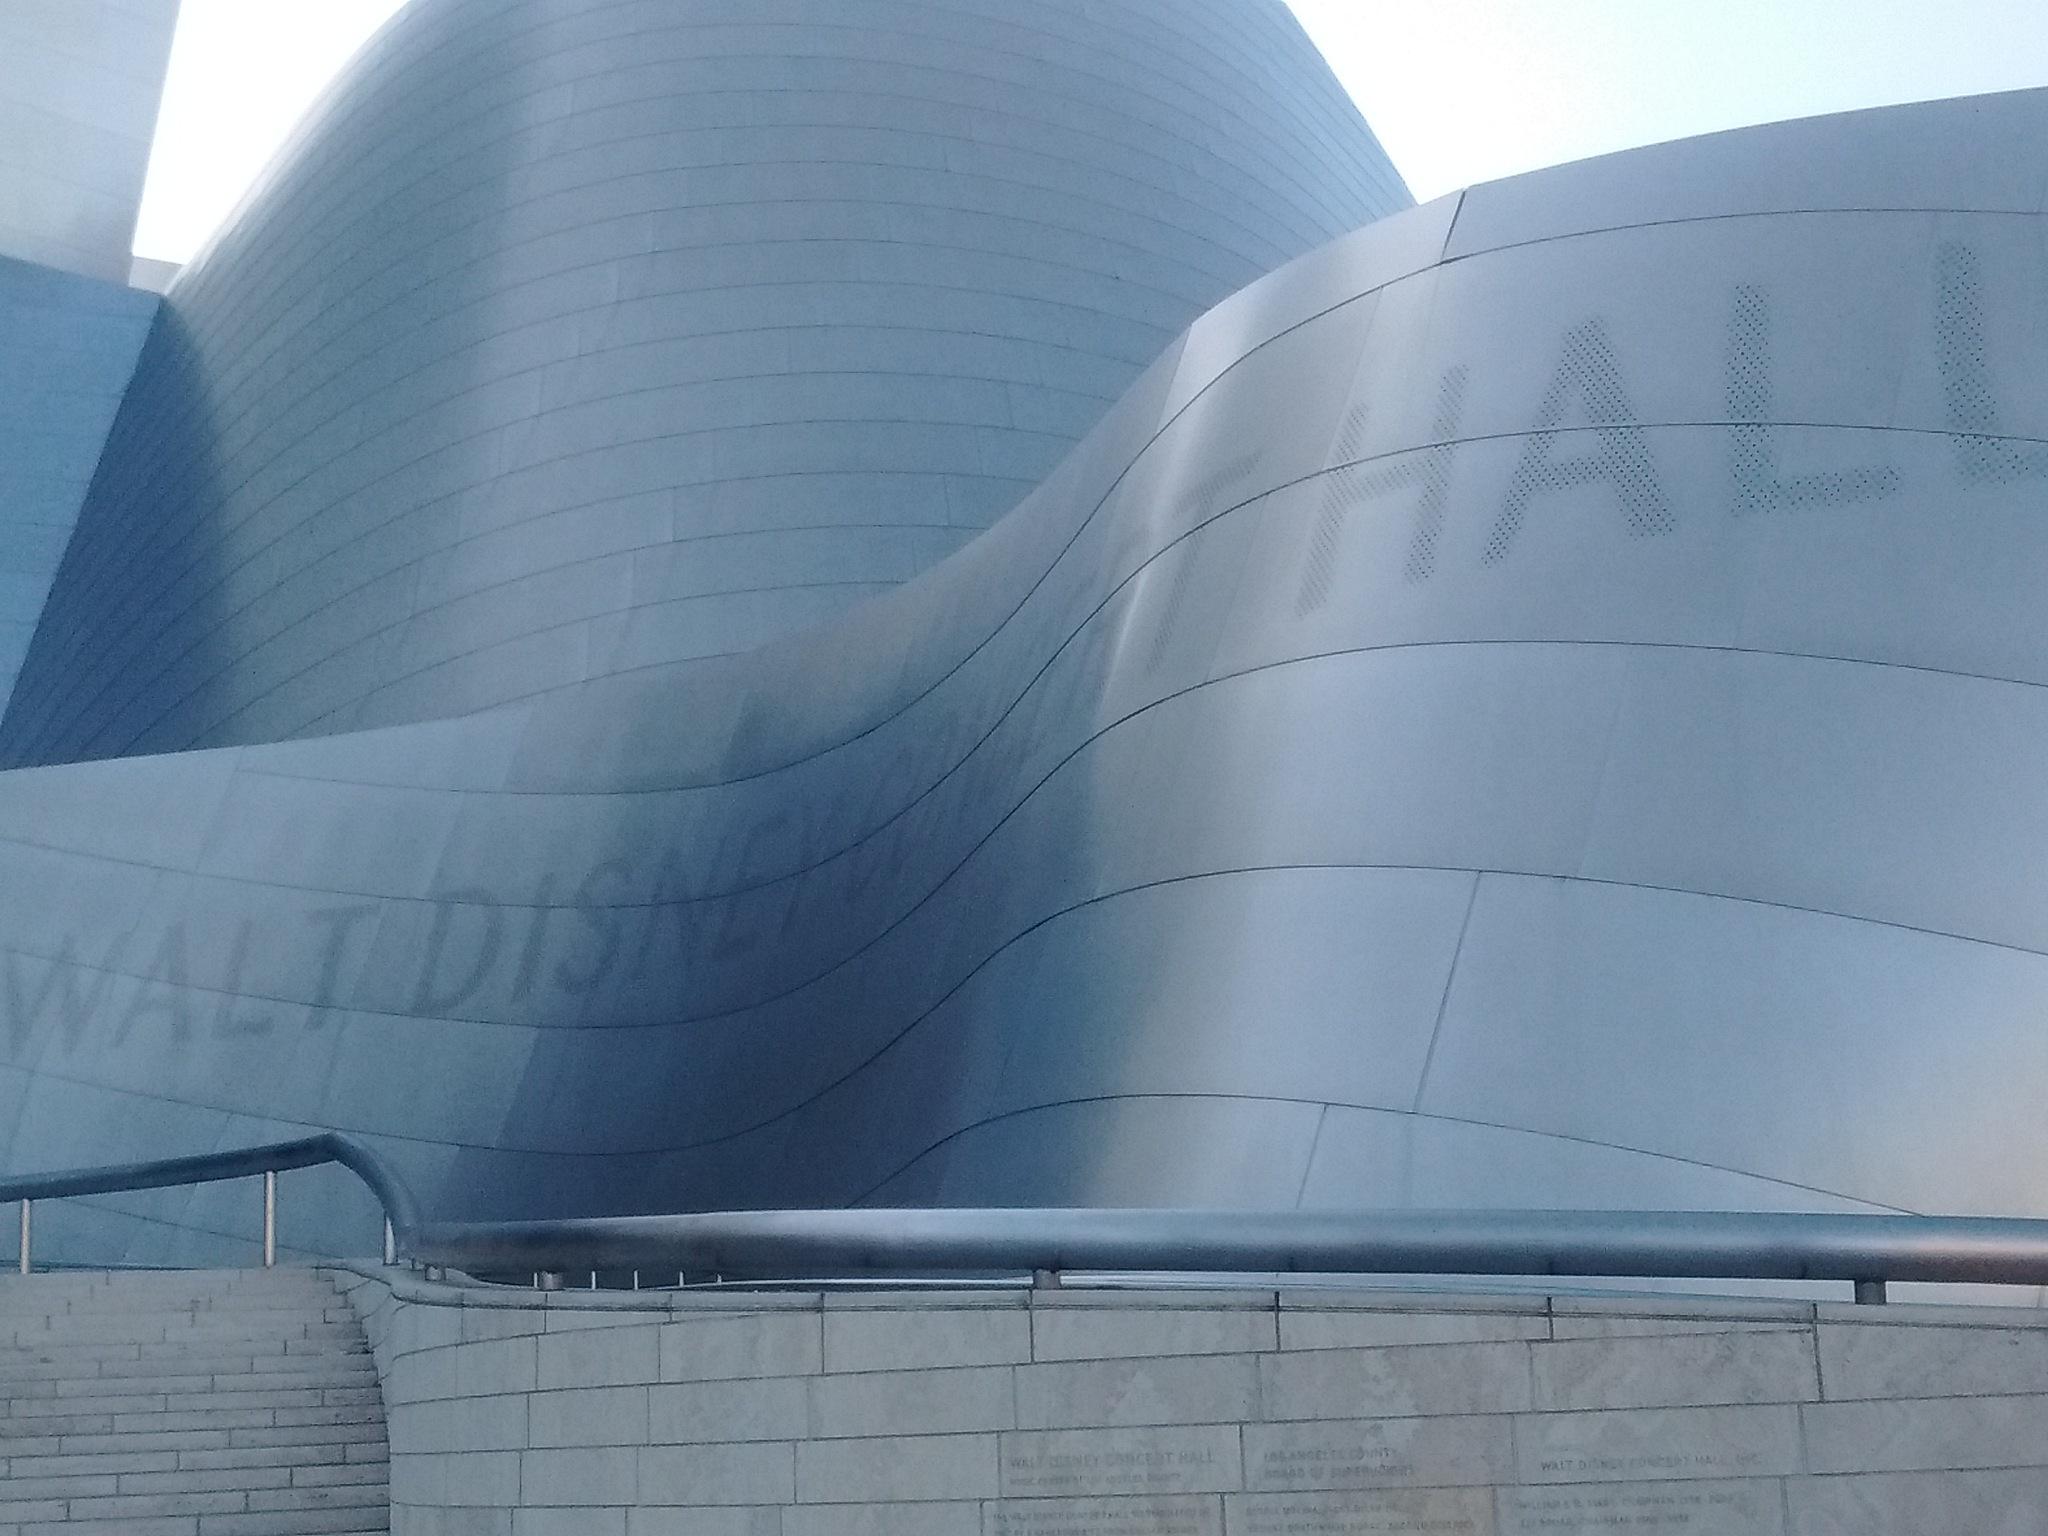 Walt Disney Concert Hall by Valerie Hall